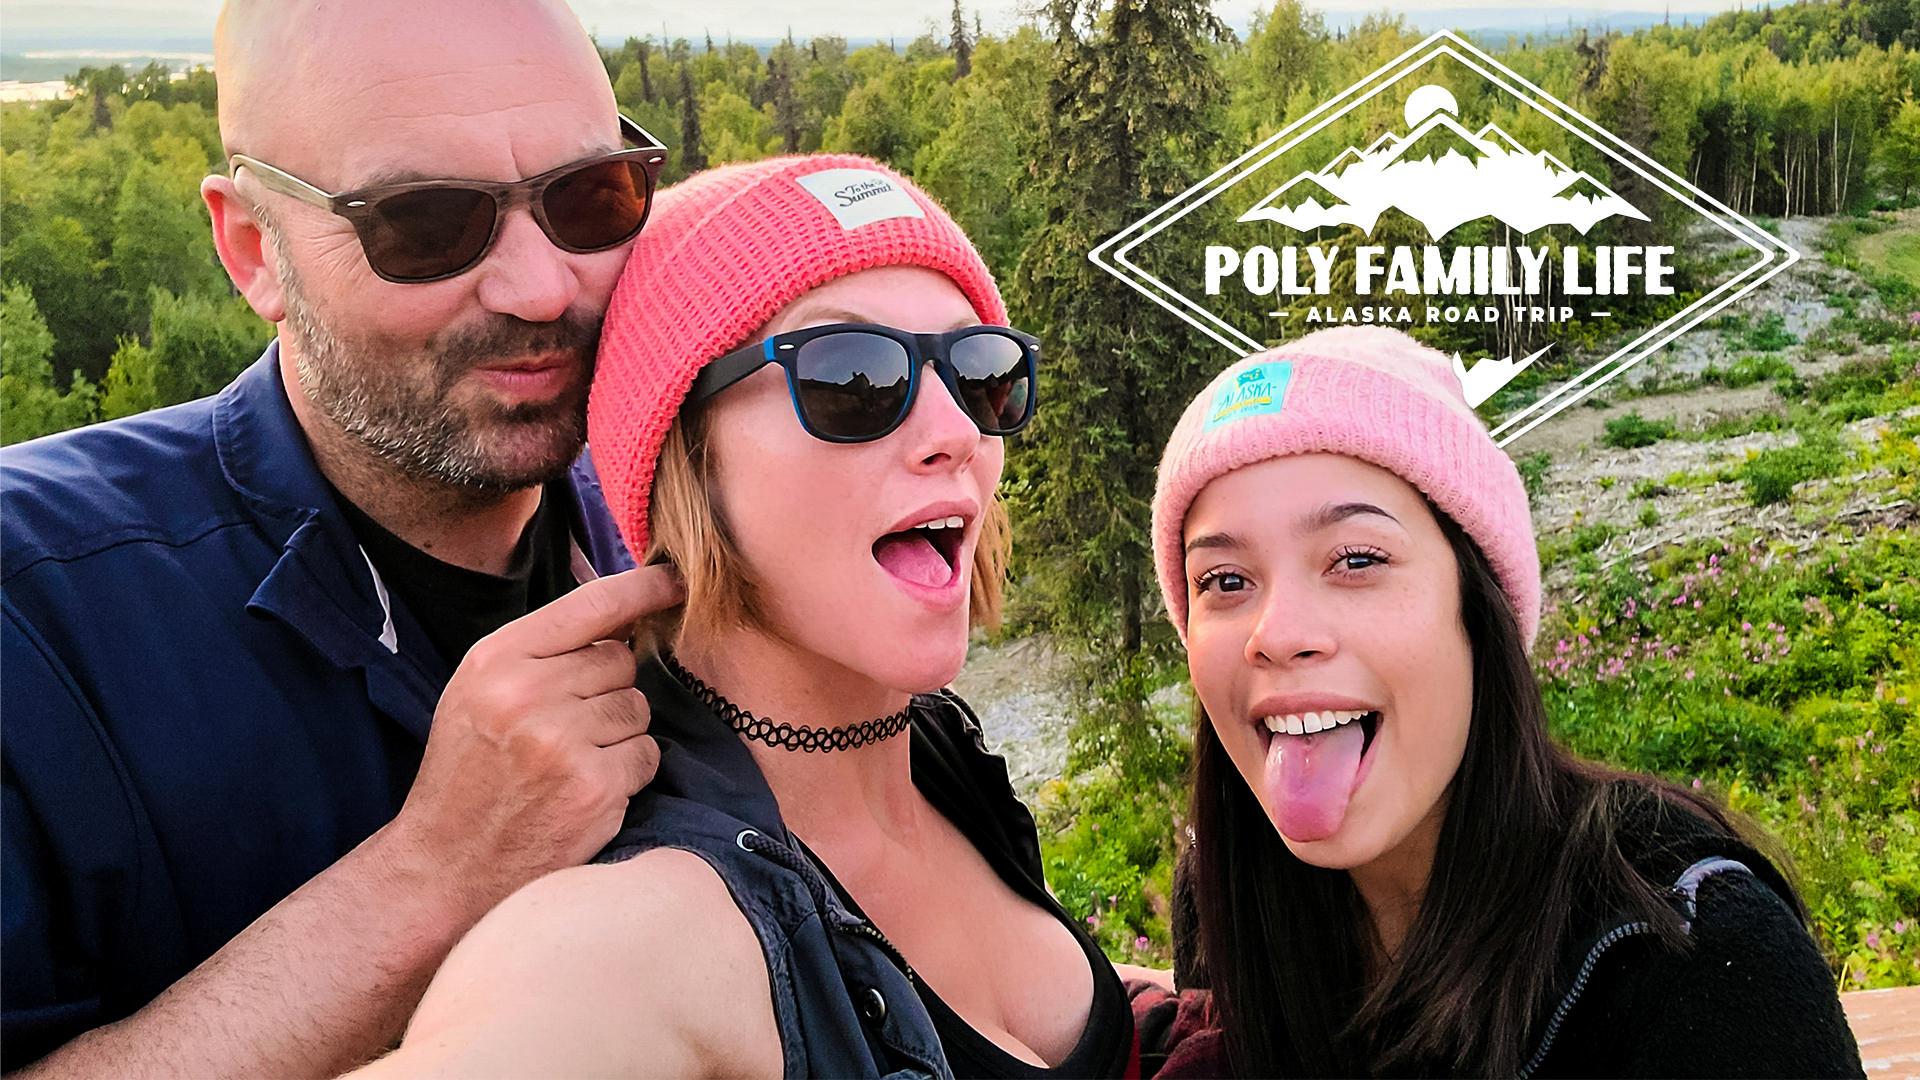 Poly Family Life: Alaska Road Trip - Episode 1 - Lana Mars & AK Gingersnaps & Smassh 1